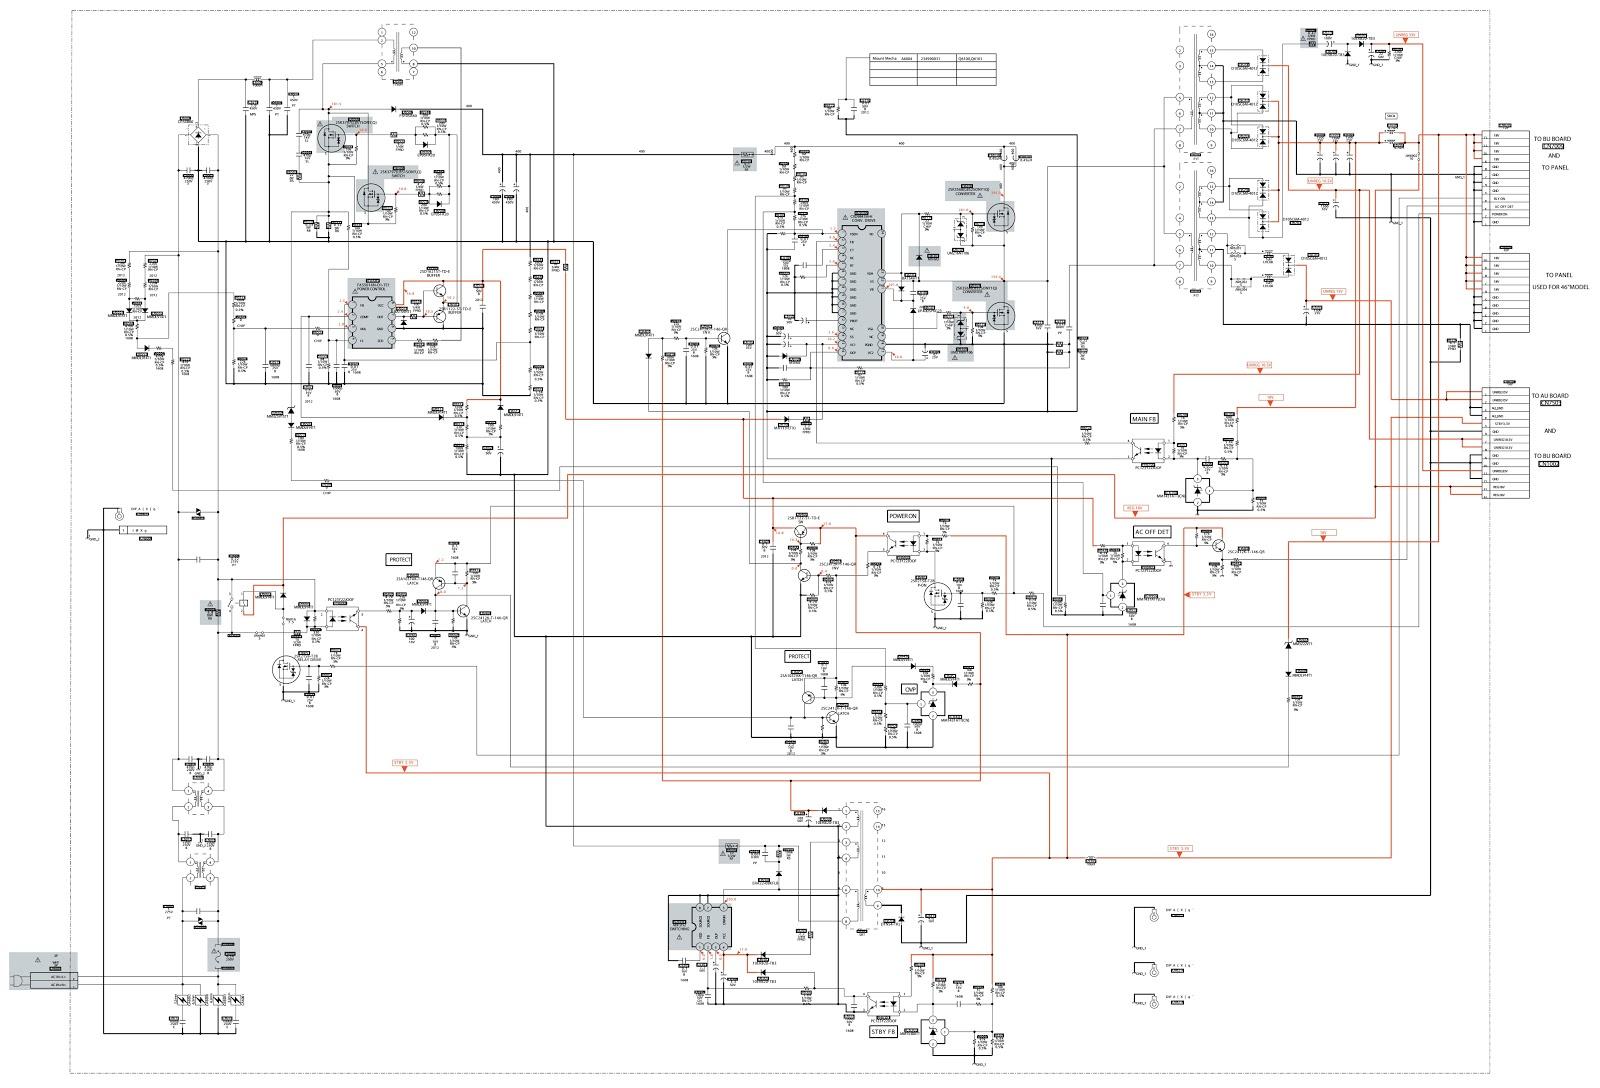 sony klv 32ex330 circuit diagram